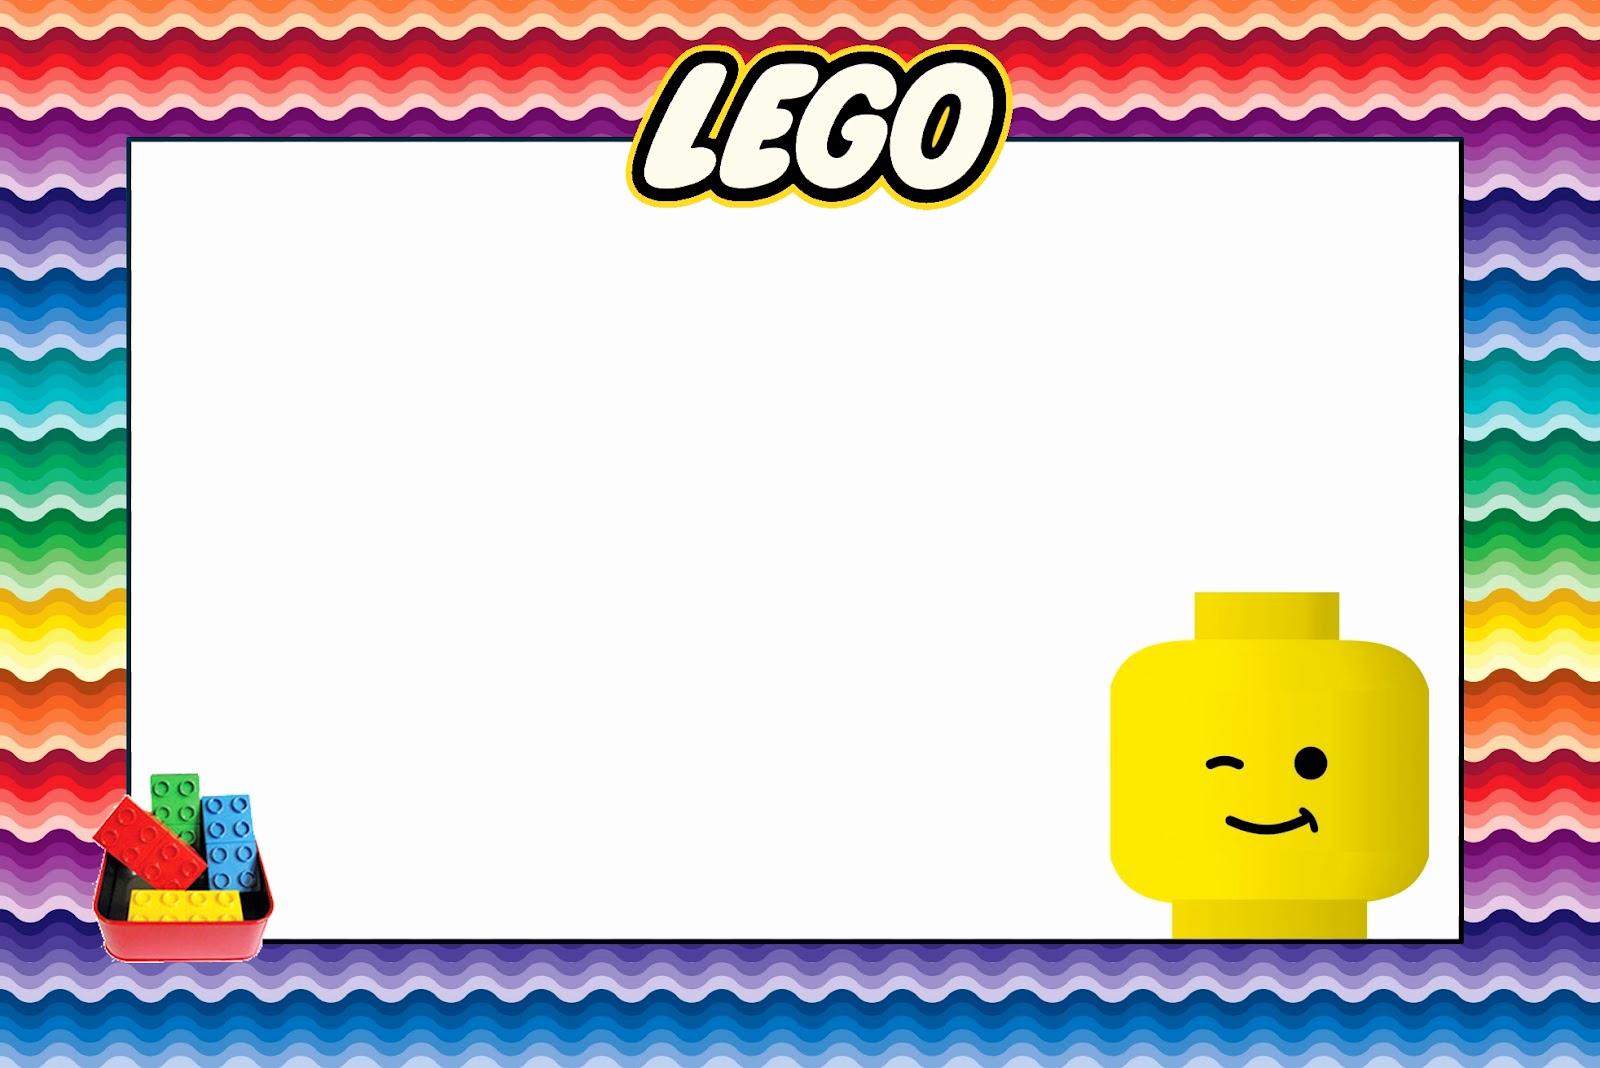 Lego Party Invitation Printable Unique Lego Free Printable Invitations